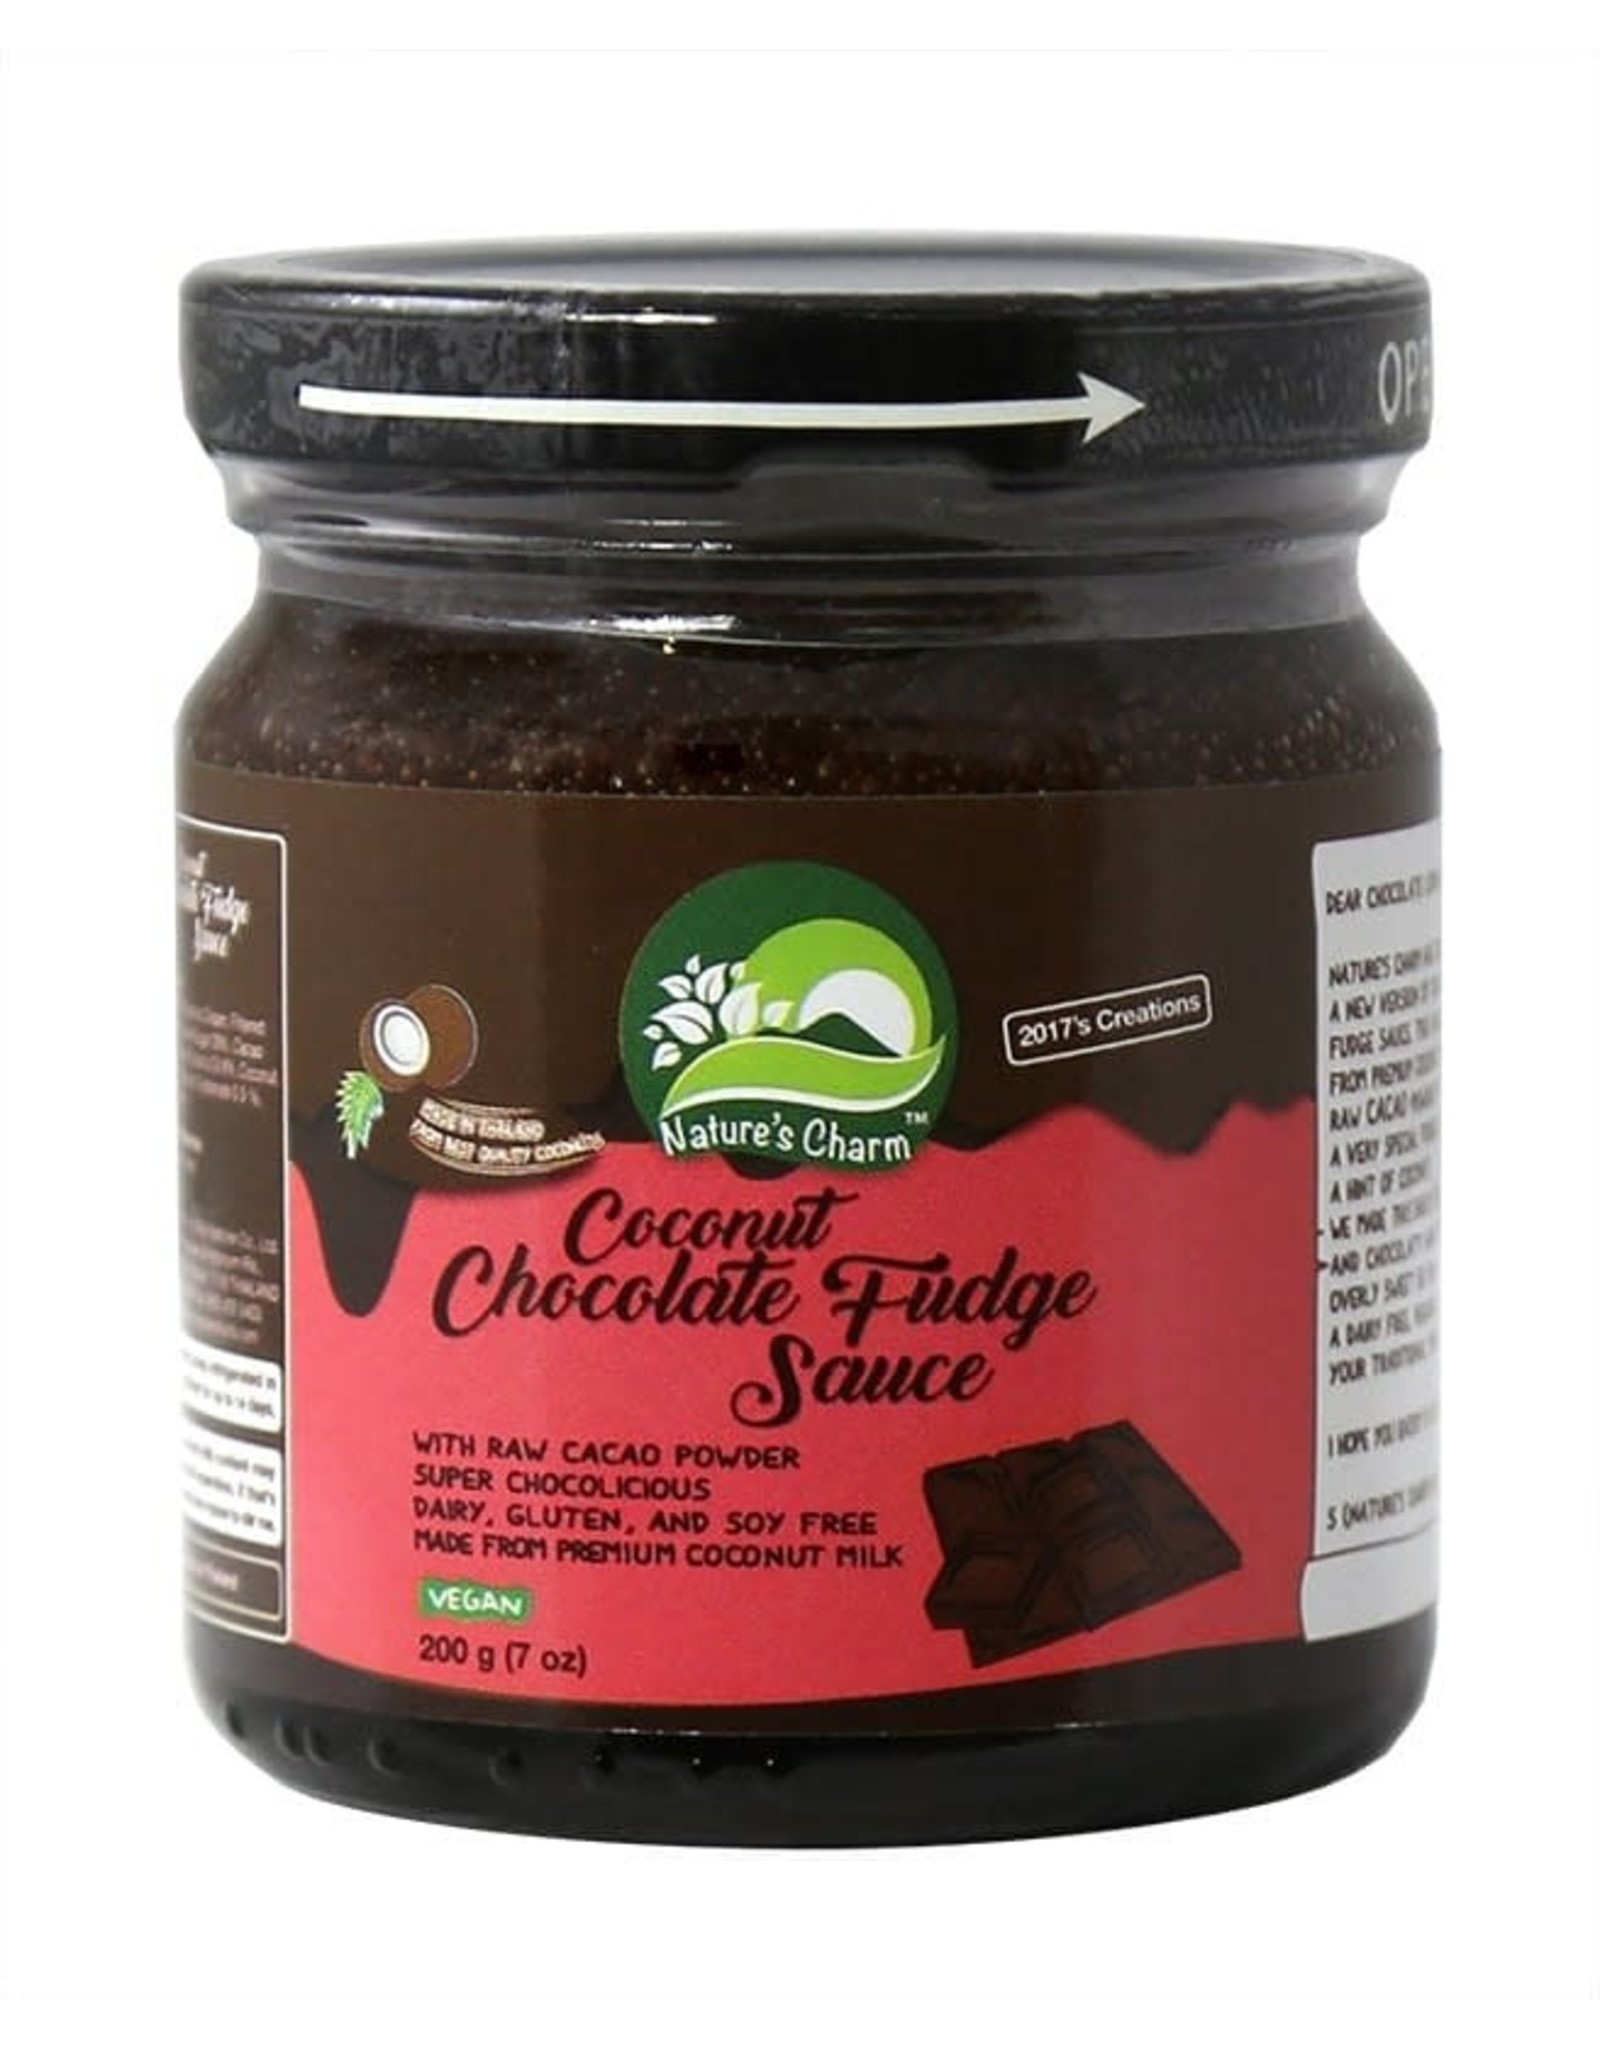 Nature's Charm Coconut Chocolade Fudge Sauce